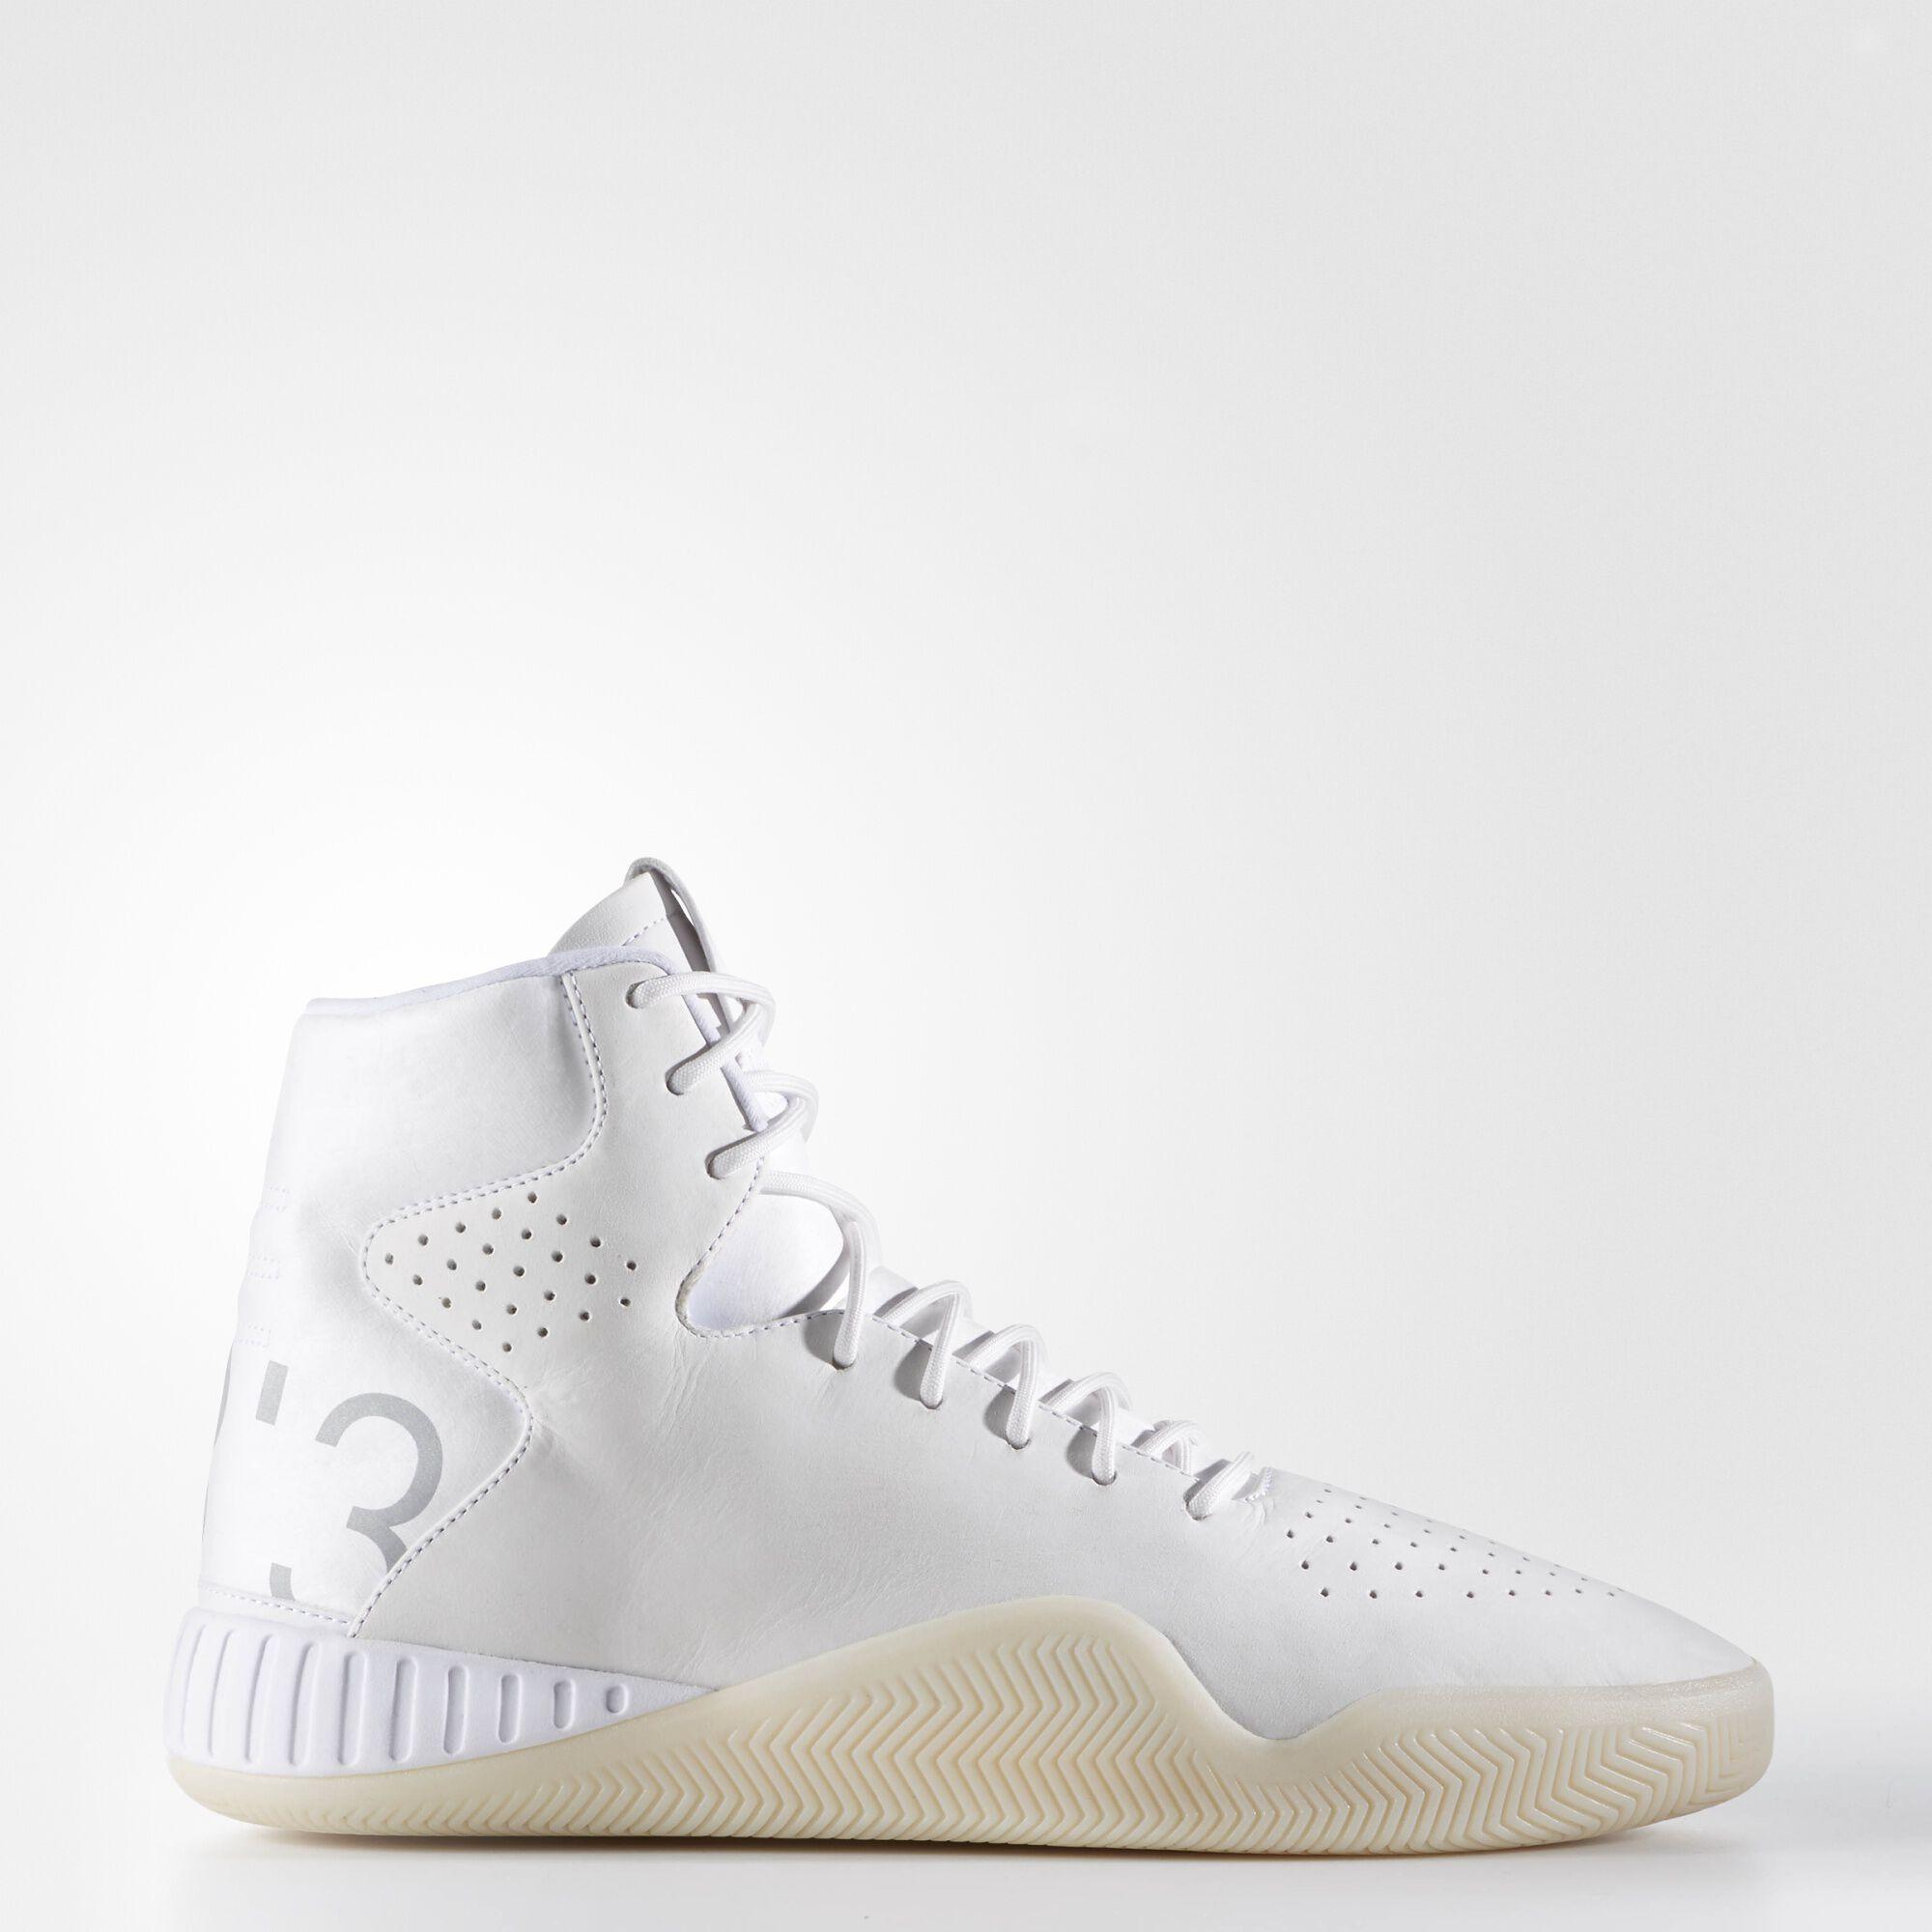 The adidas Tubular Defiant Looks Pretty Sleek On Feet!